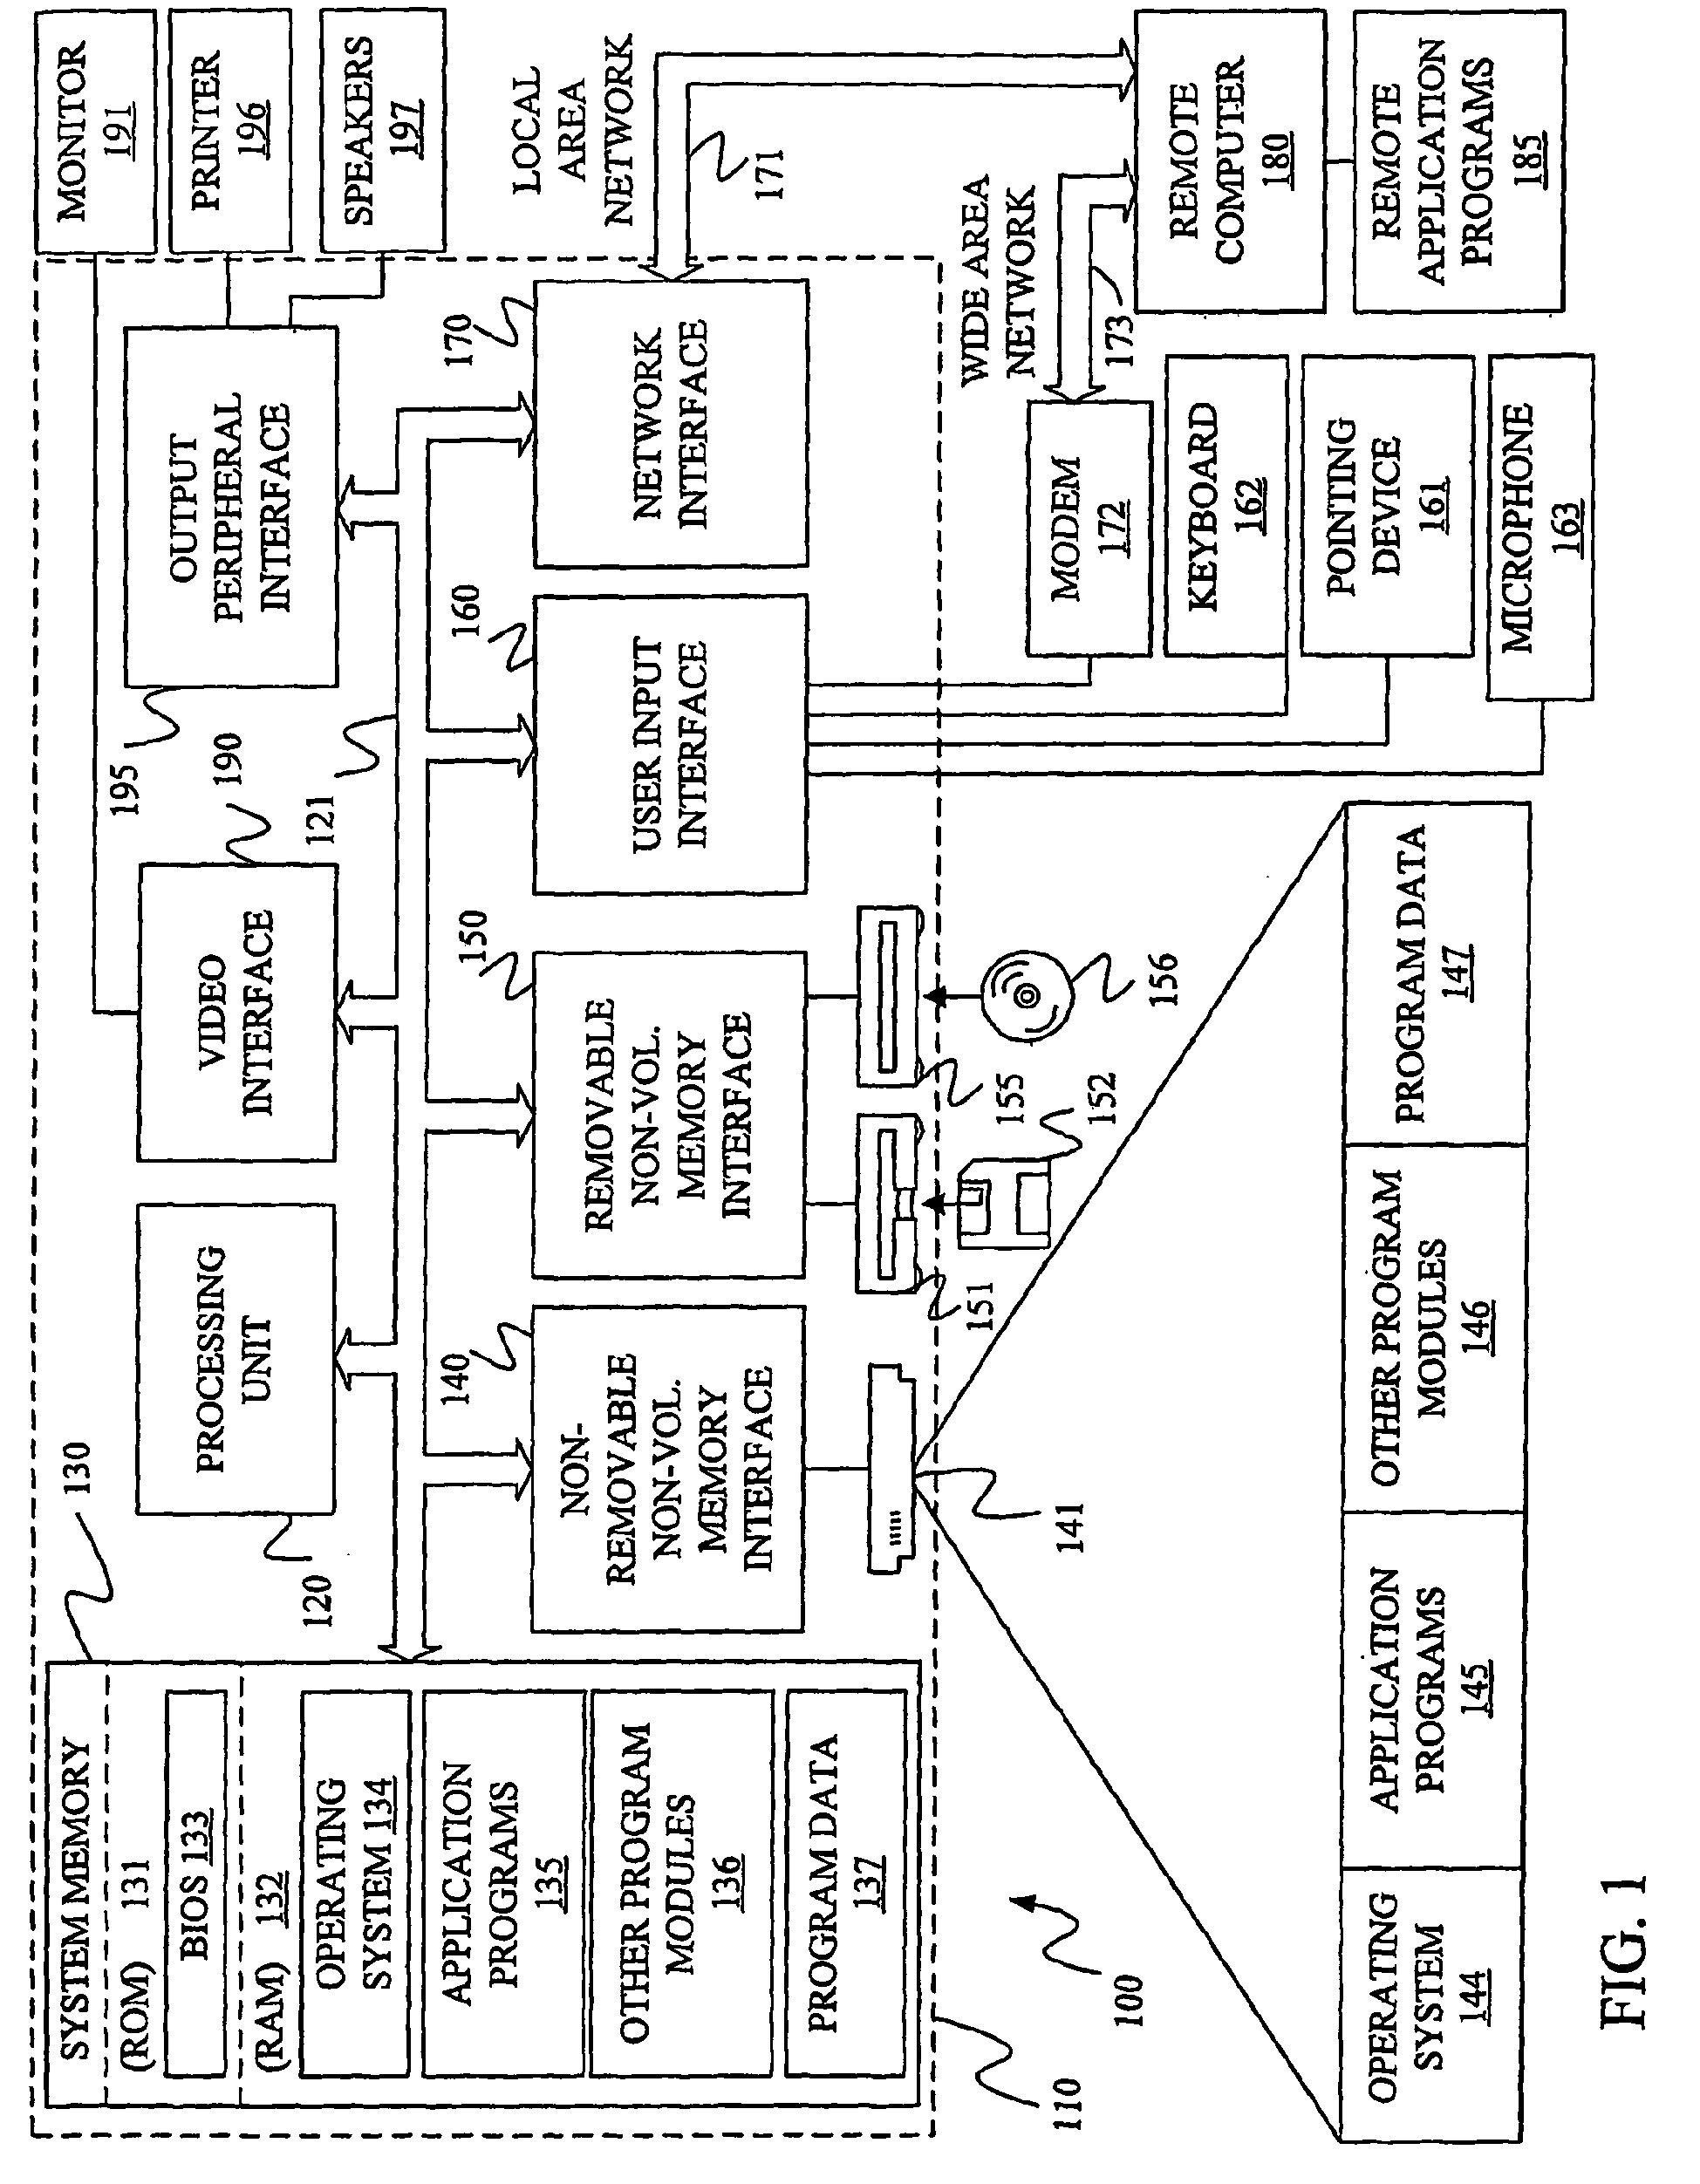 patent ep1891545b1 sprachmodellkomprimierungsmodelle mit. Black Bedroom Furniture Sets. Home Design Ideas